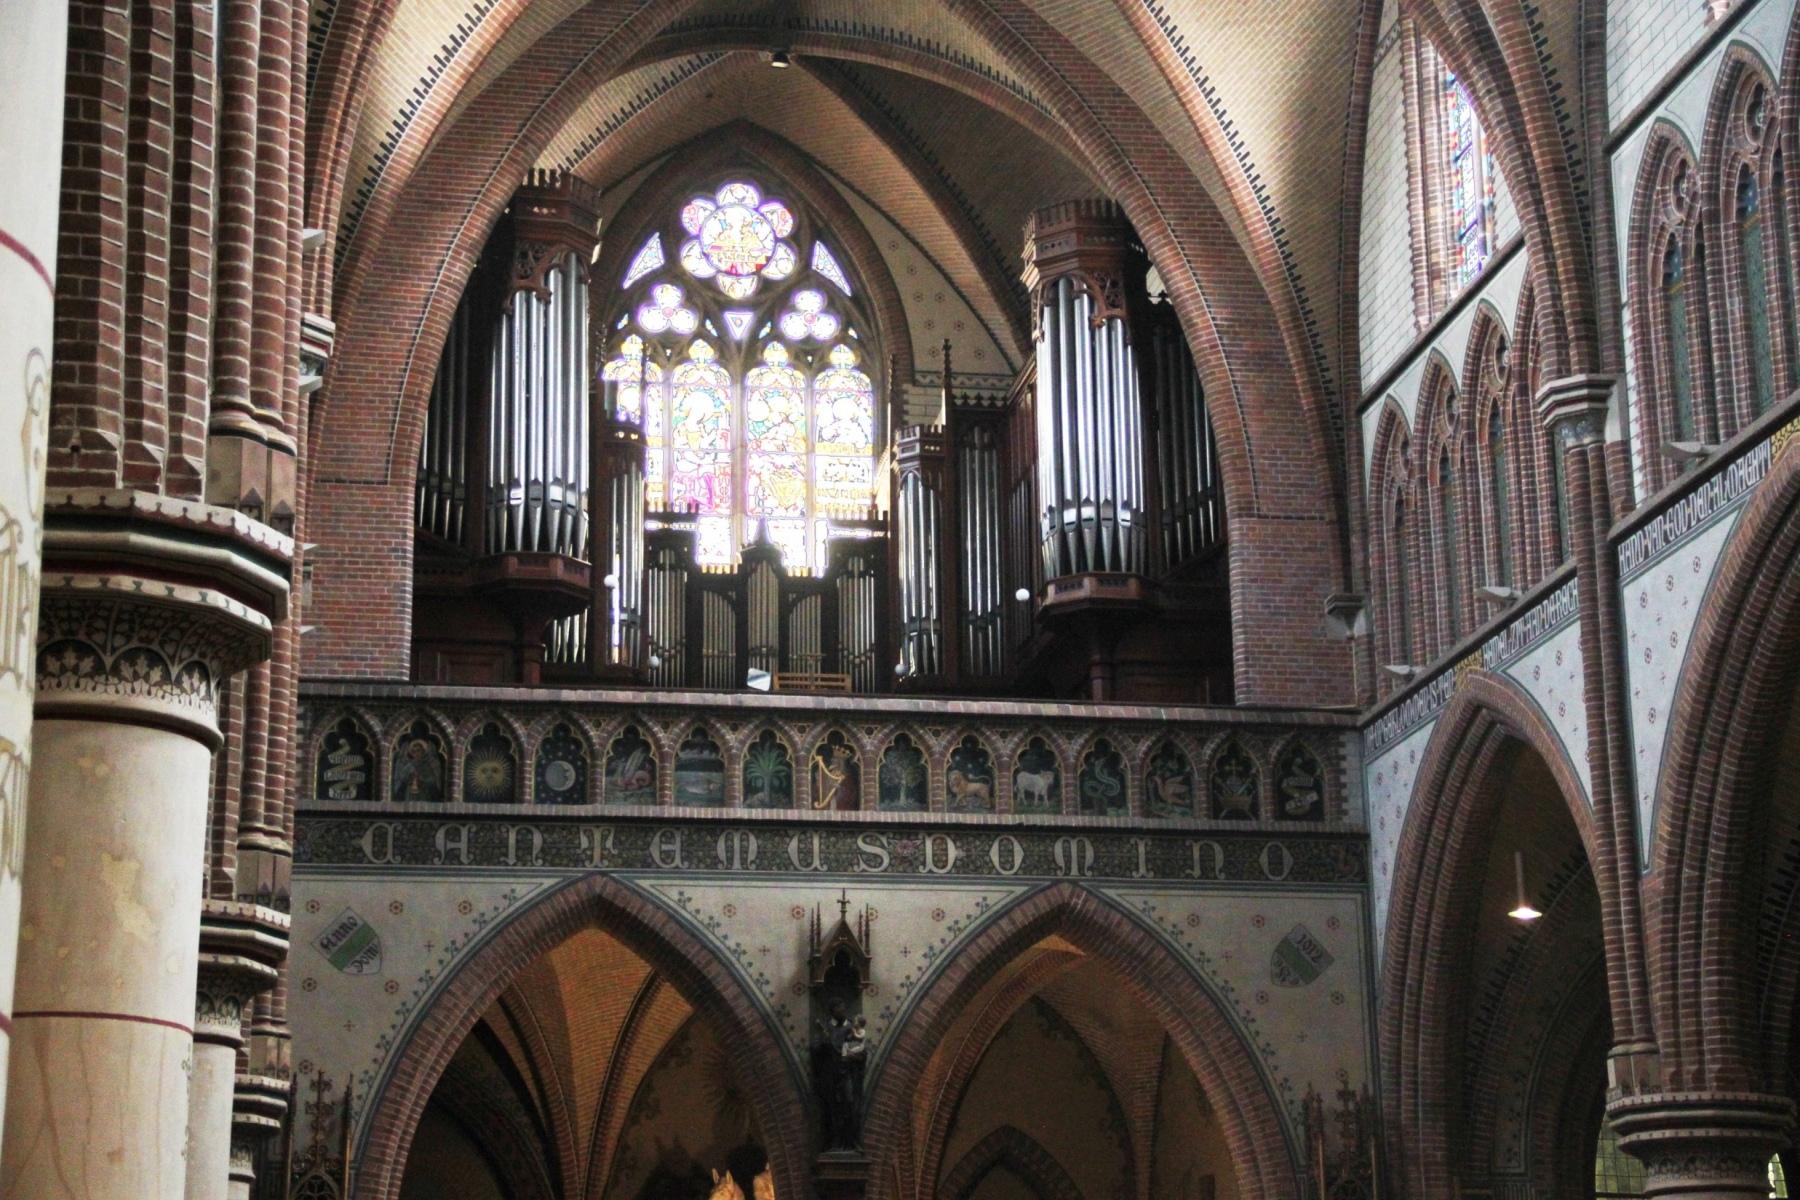 Orgel_van_dichtbij_groot_tbv_site